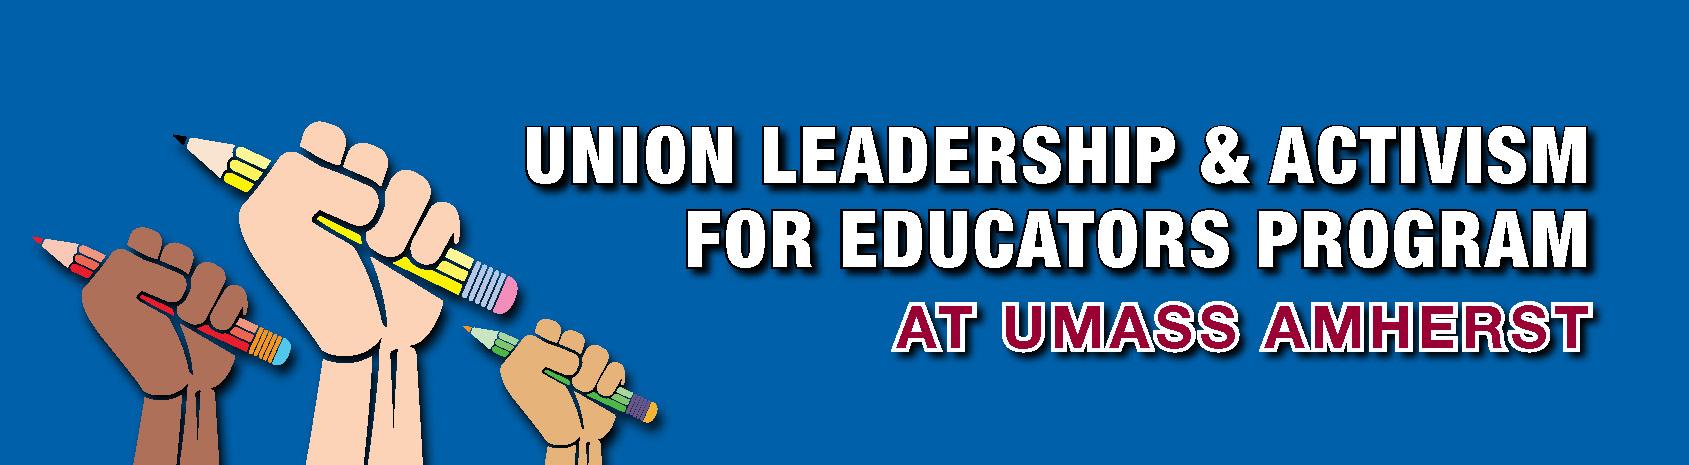 union leadership & activism